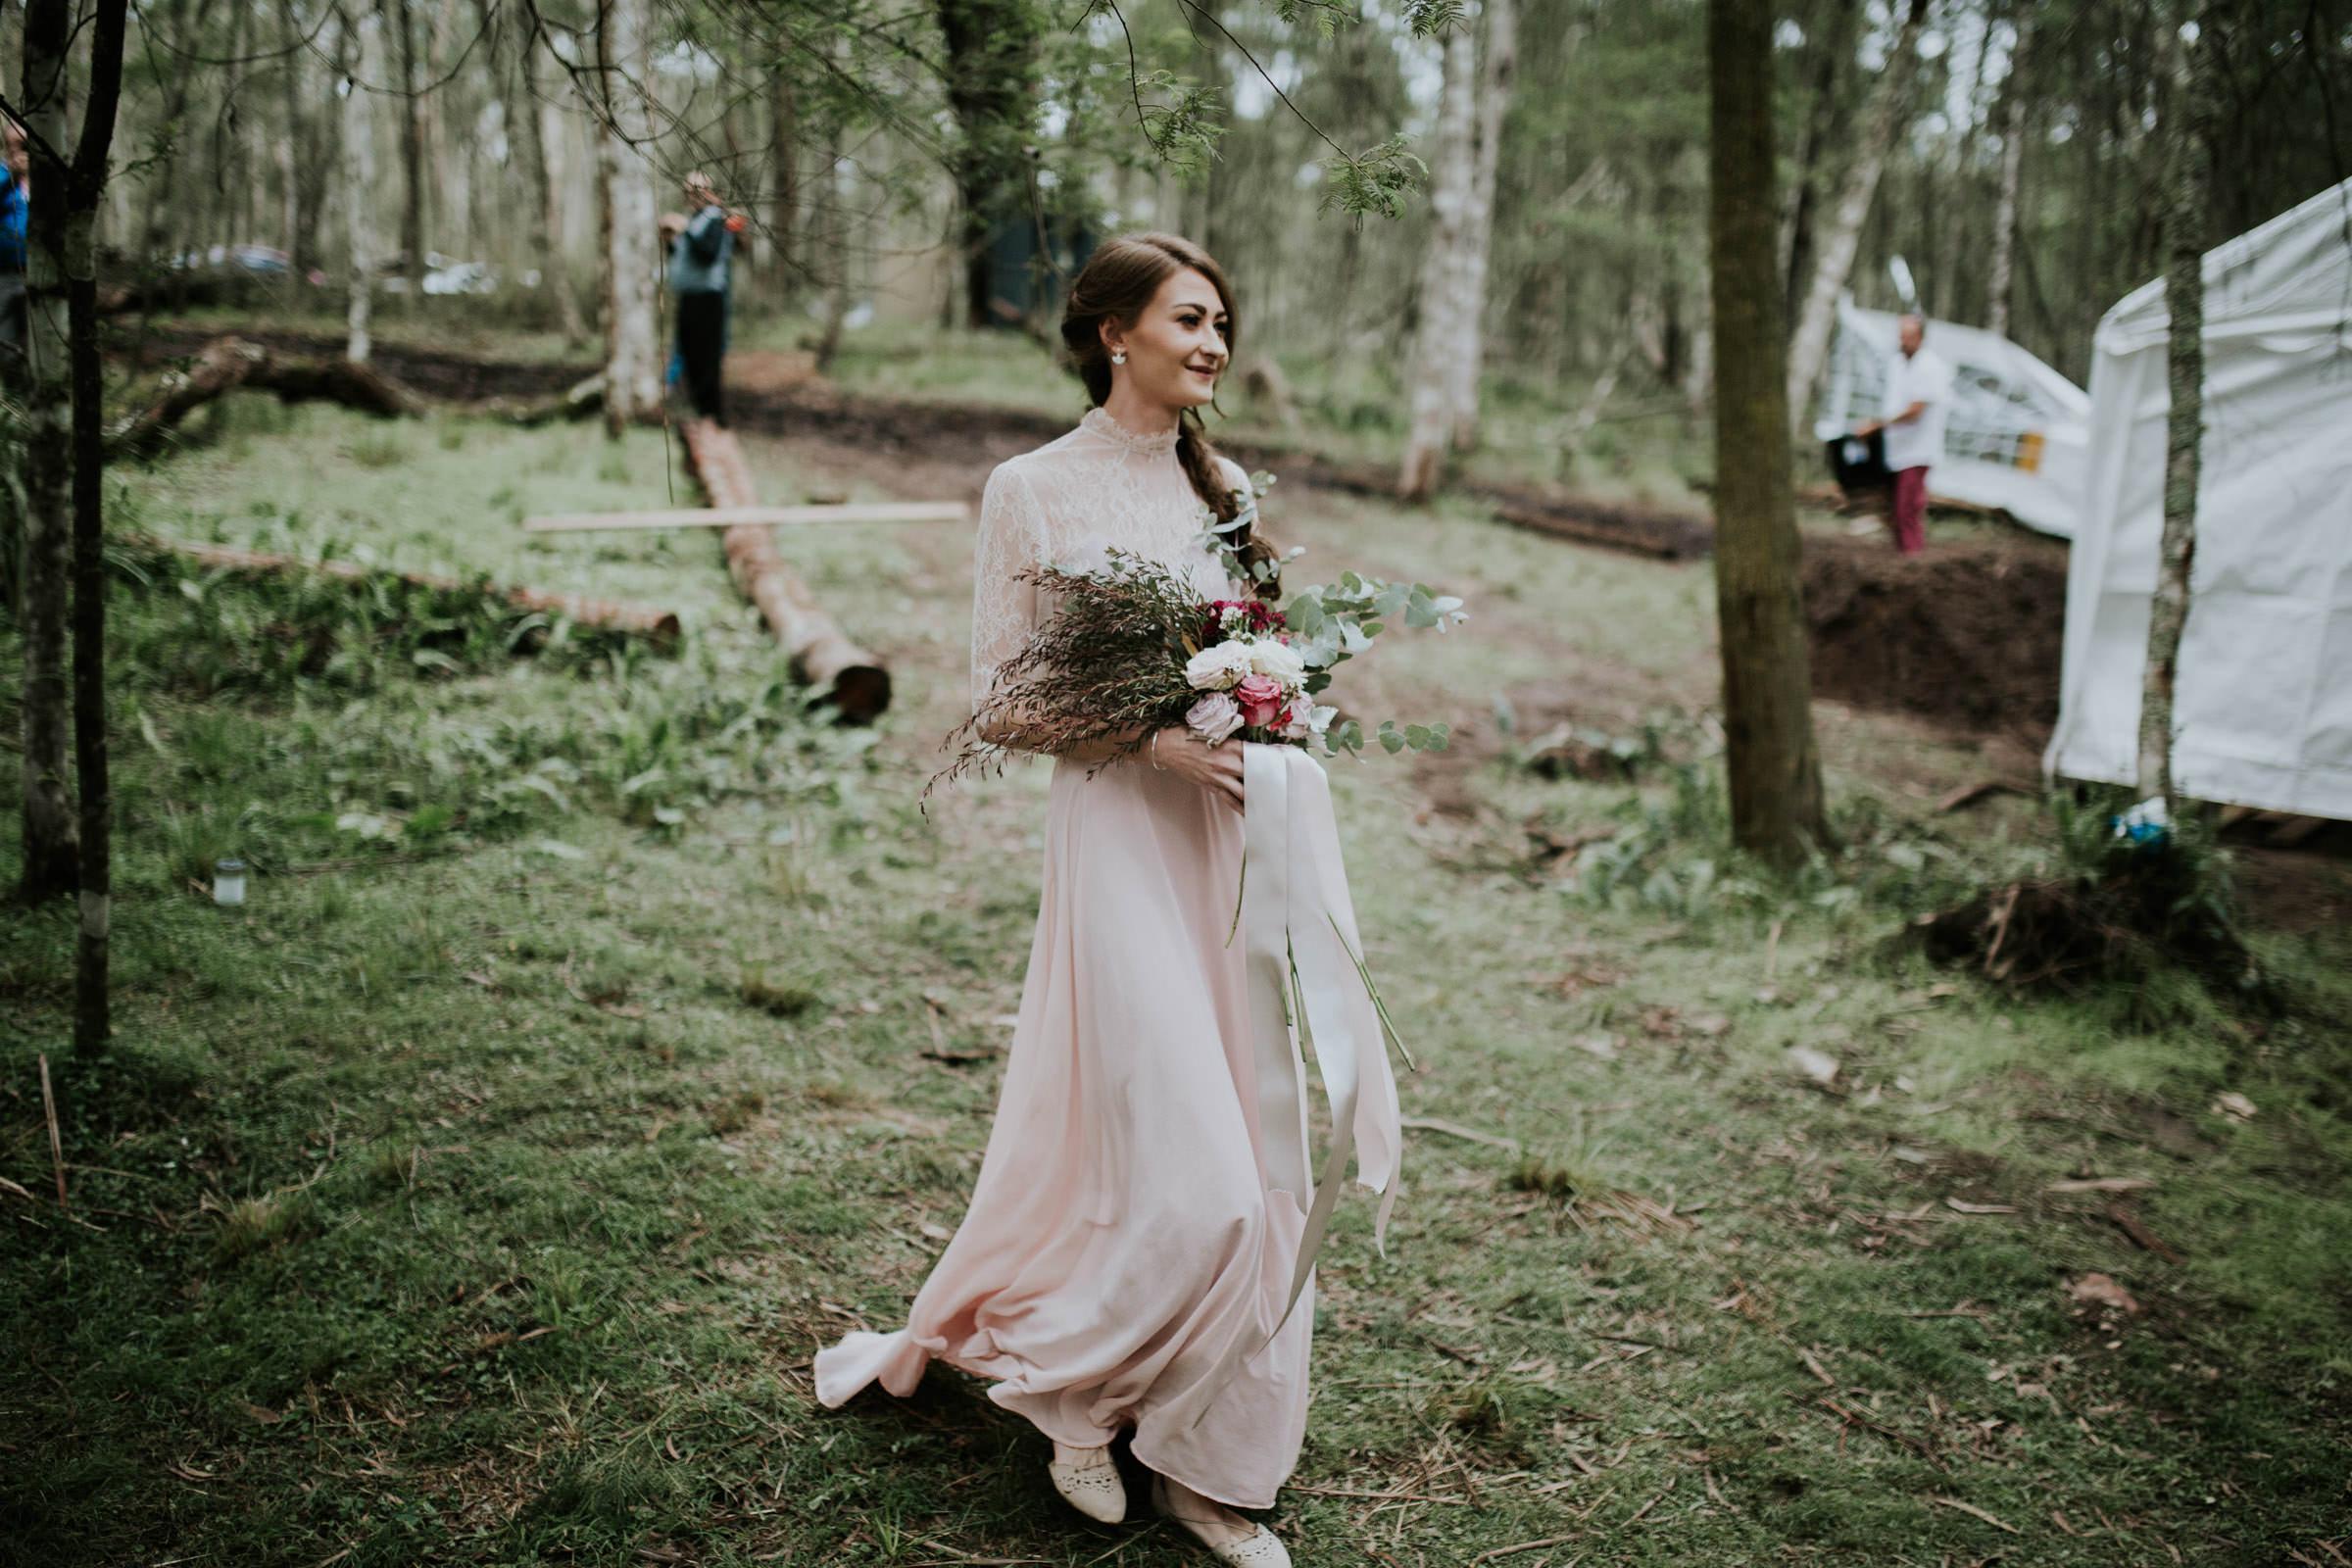 Emma+John+Far+South+Coast+Wedding+Festivl+Glamping+Bush-91.jpg